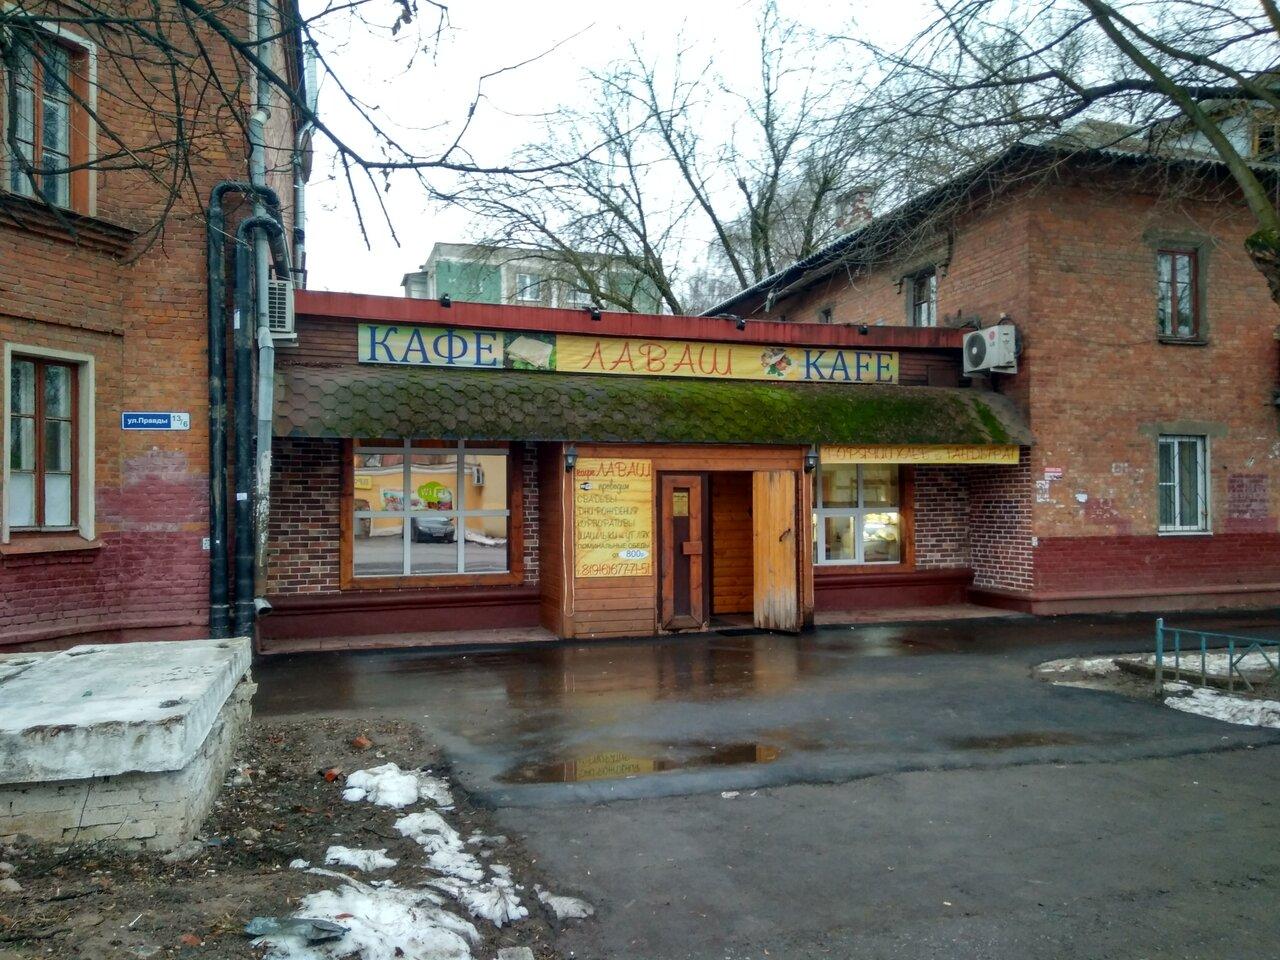 Кафе одесса нижний новгород фото адрес